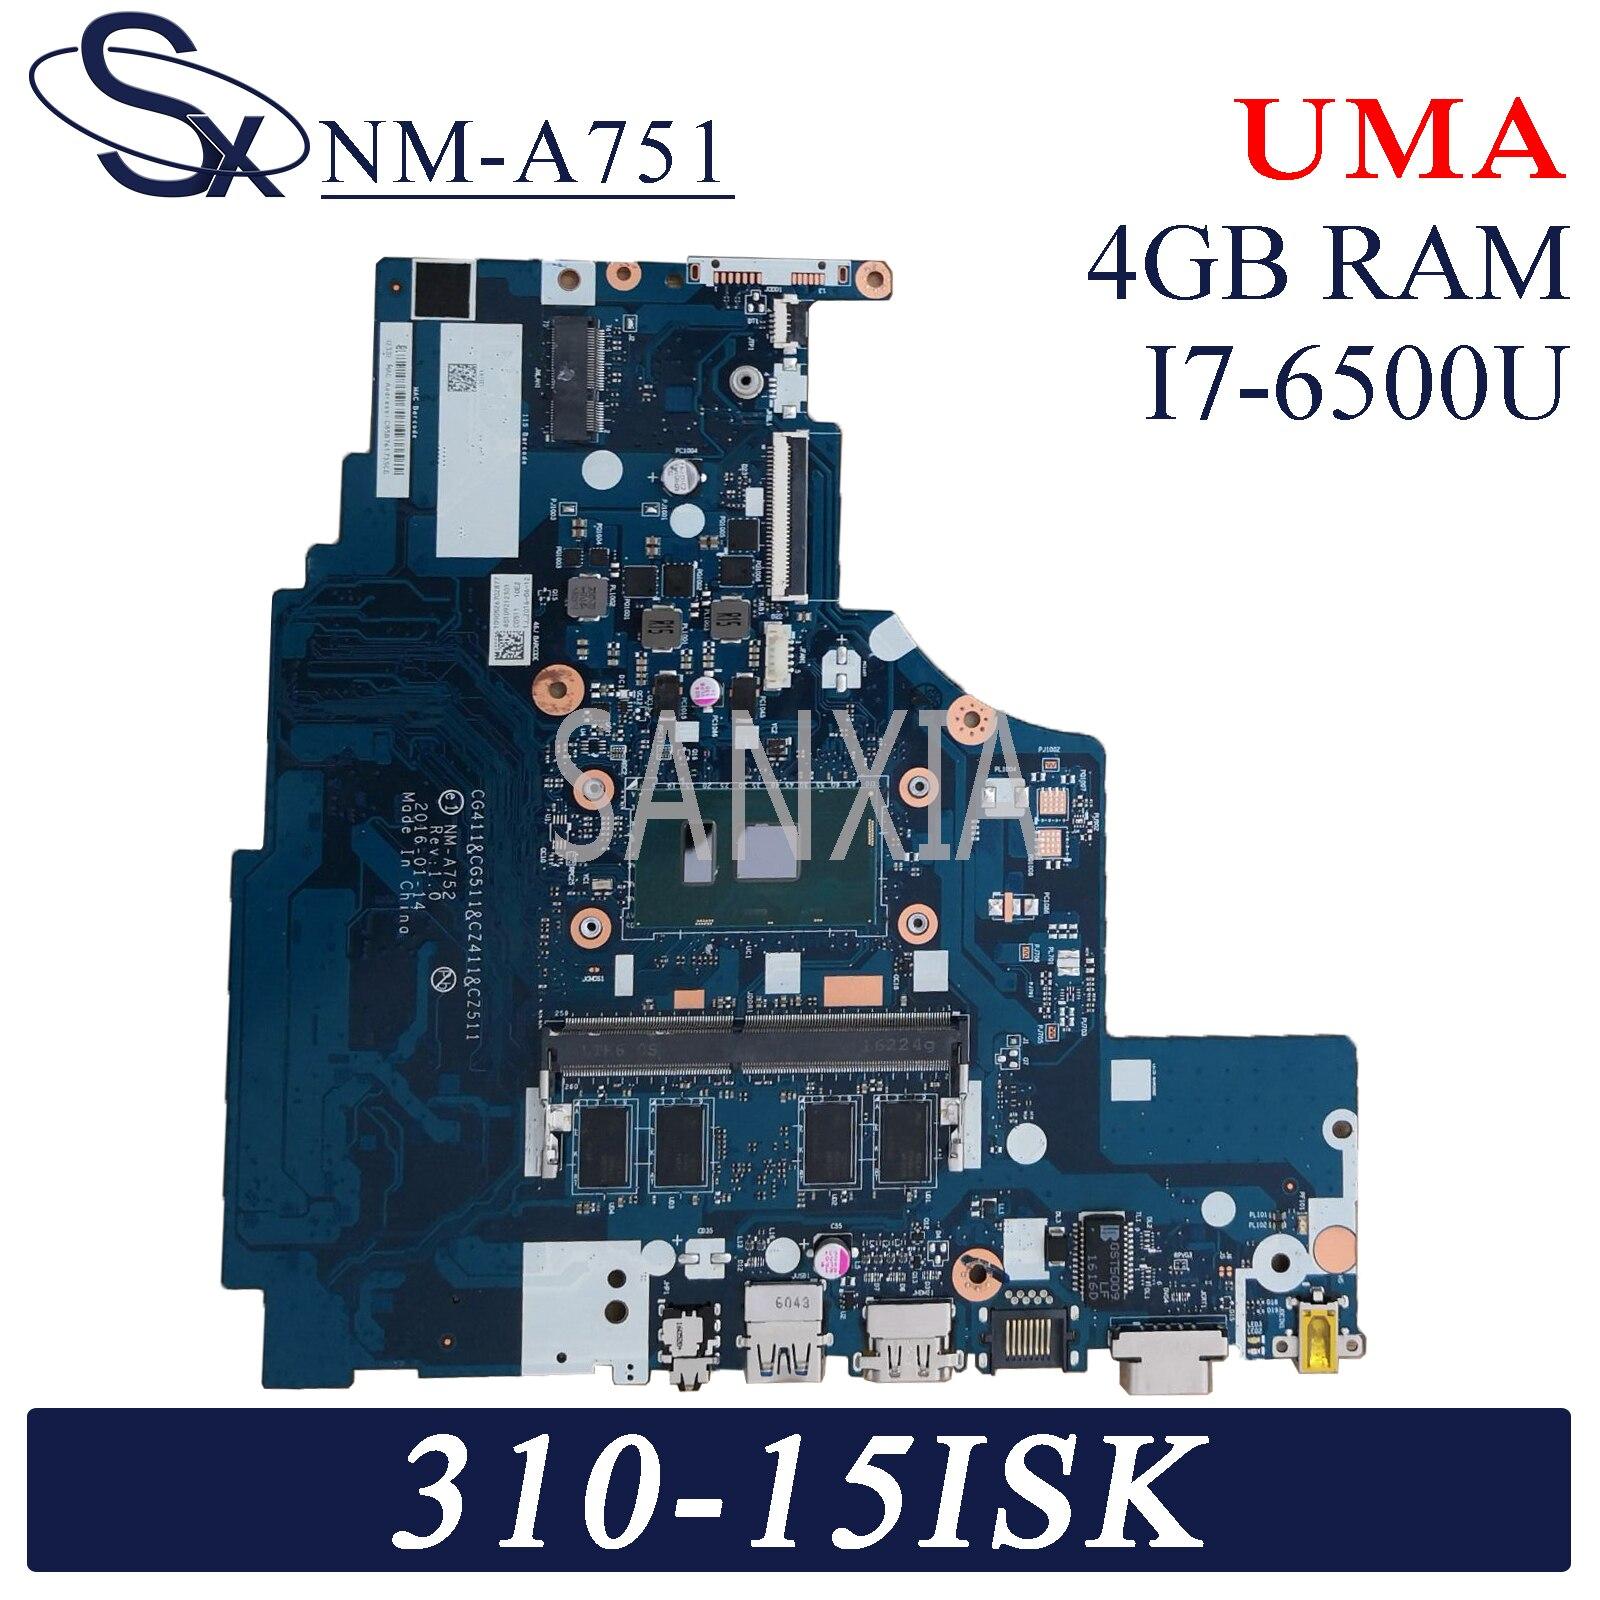 KEFU NM-A752 اللوحة الأم لأجهزة الكمبيوتر المحمول لينوفو 310-15ISK 310-15IKB اللوحة الرئيسية الأصلية 4GB-RAM I7-6500UUMA